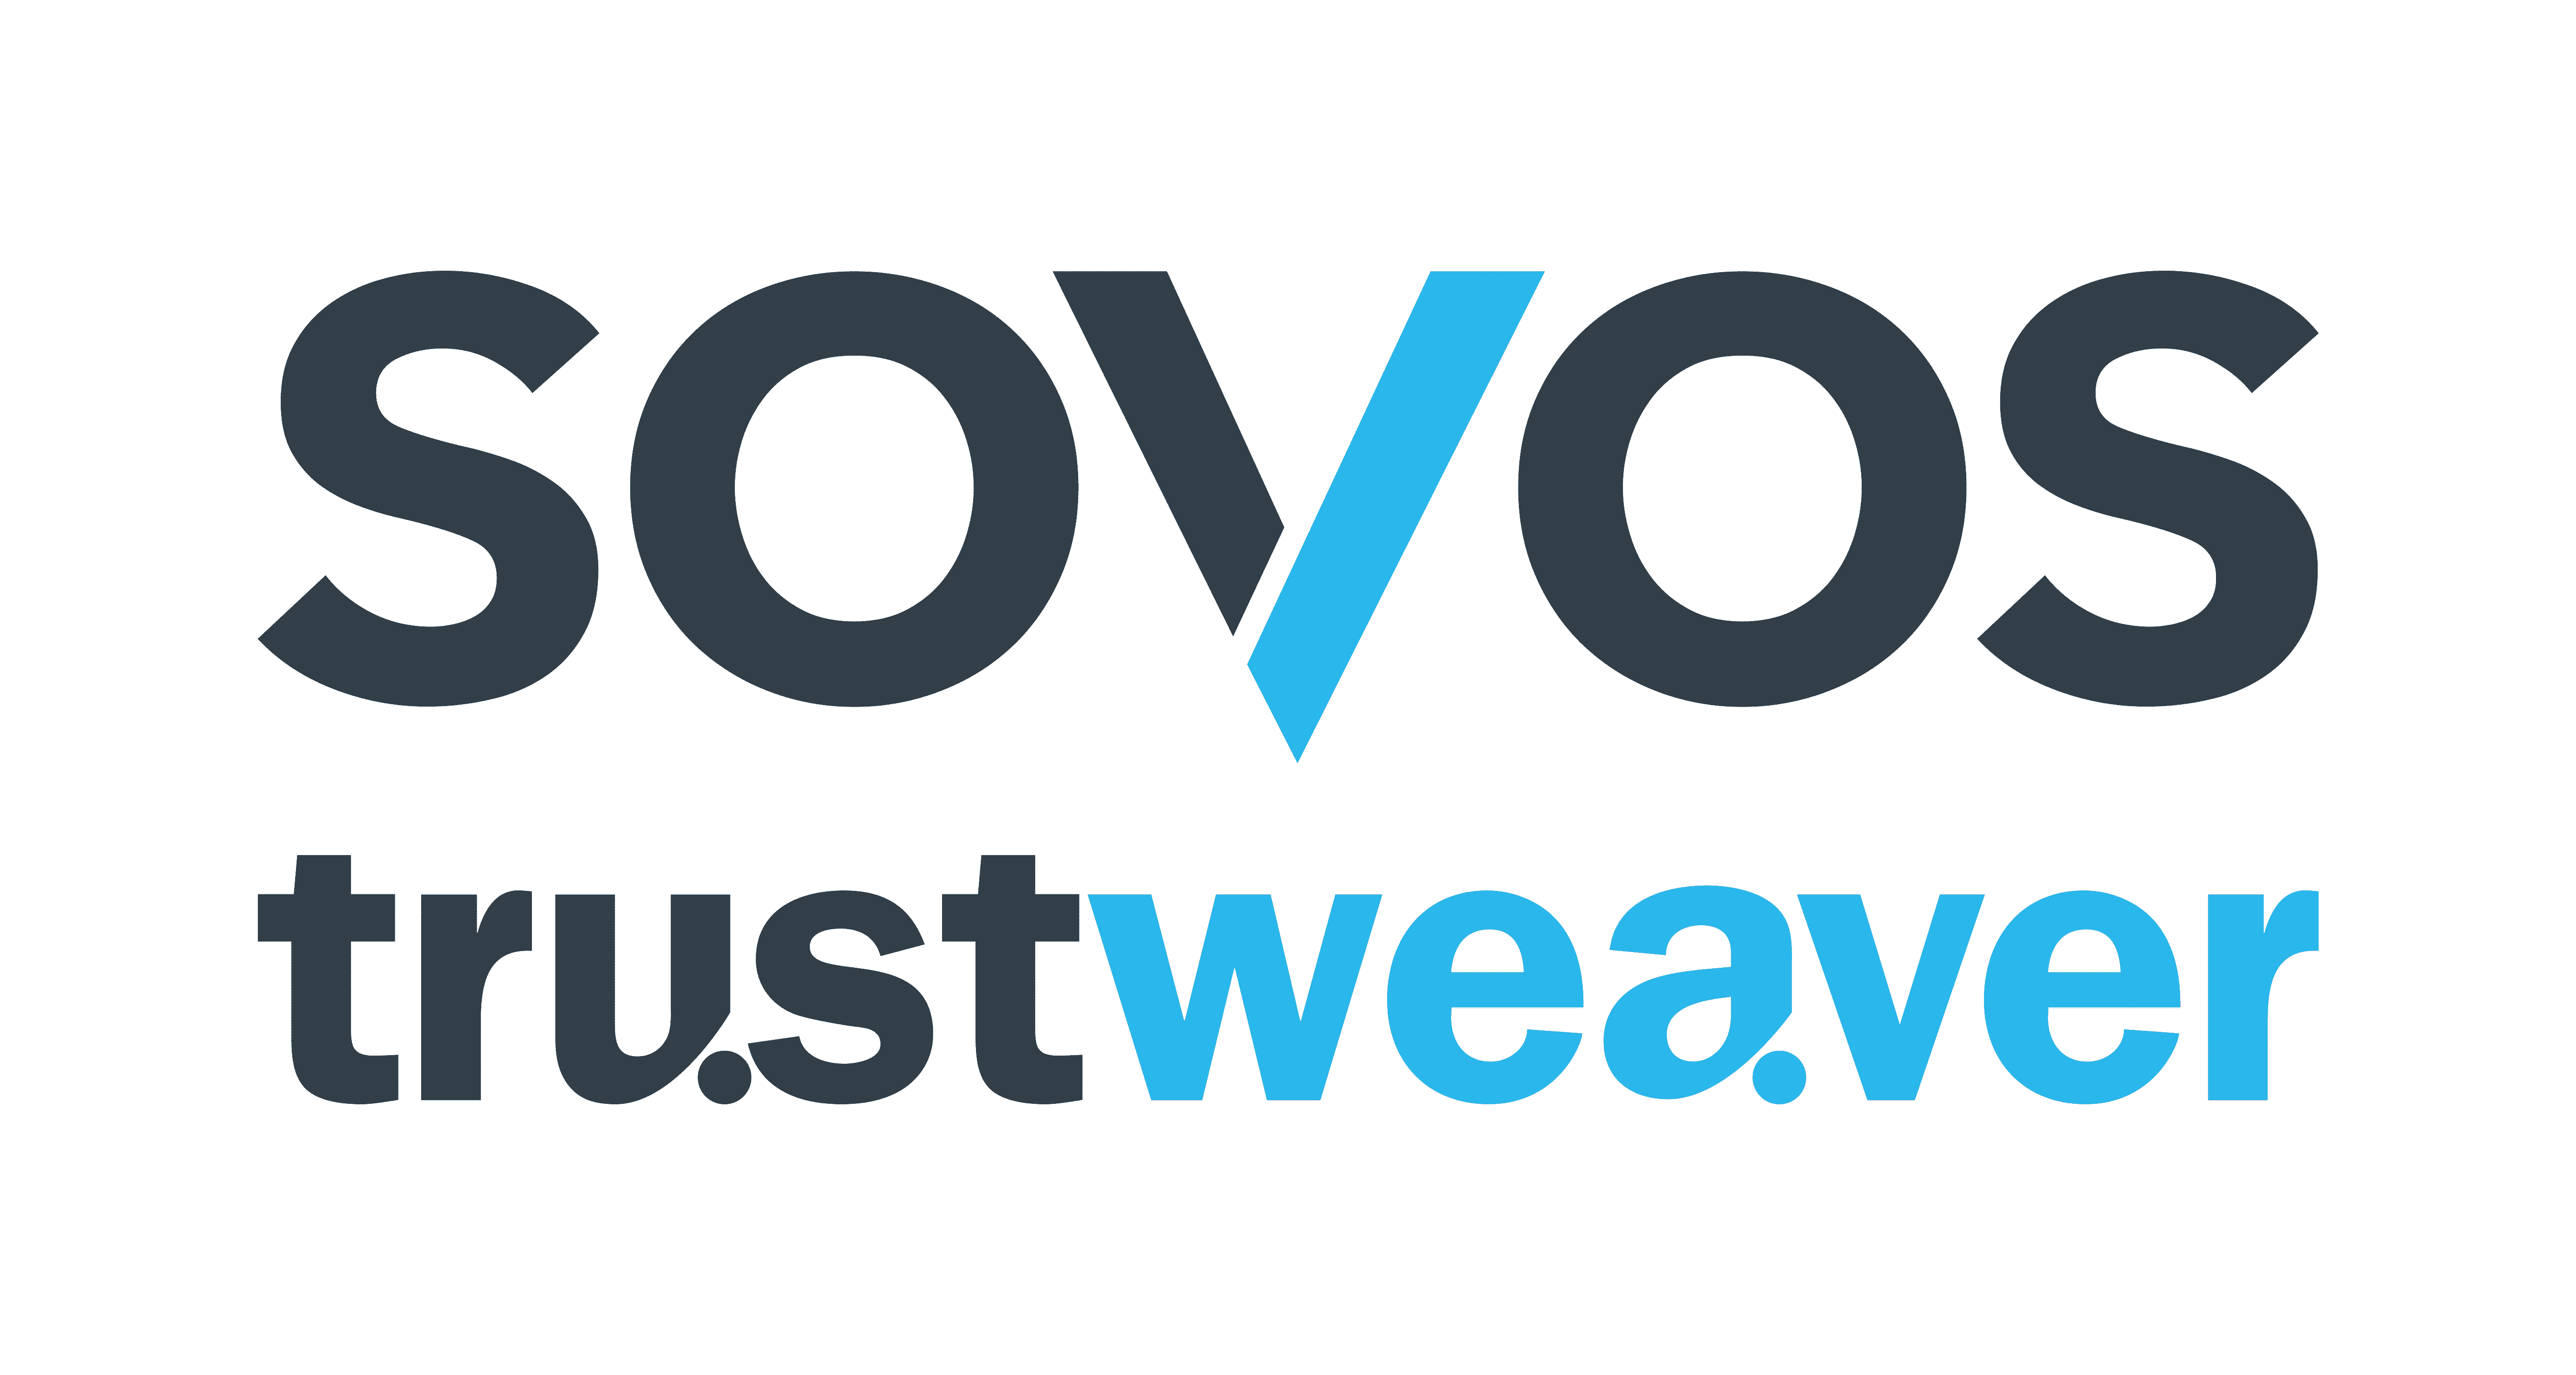 Sovos Trustweaver